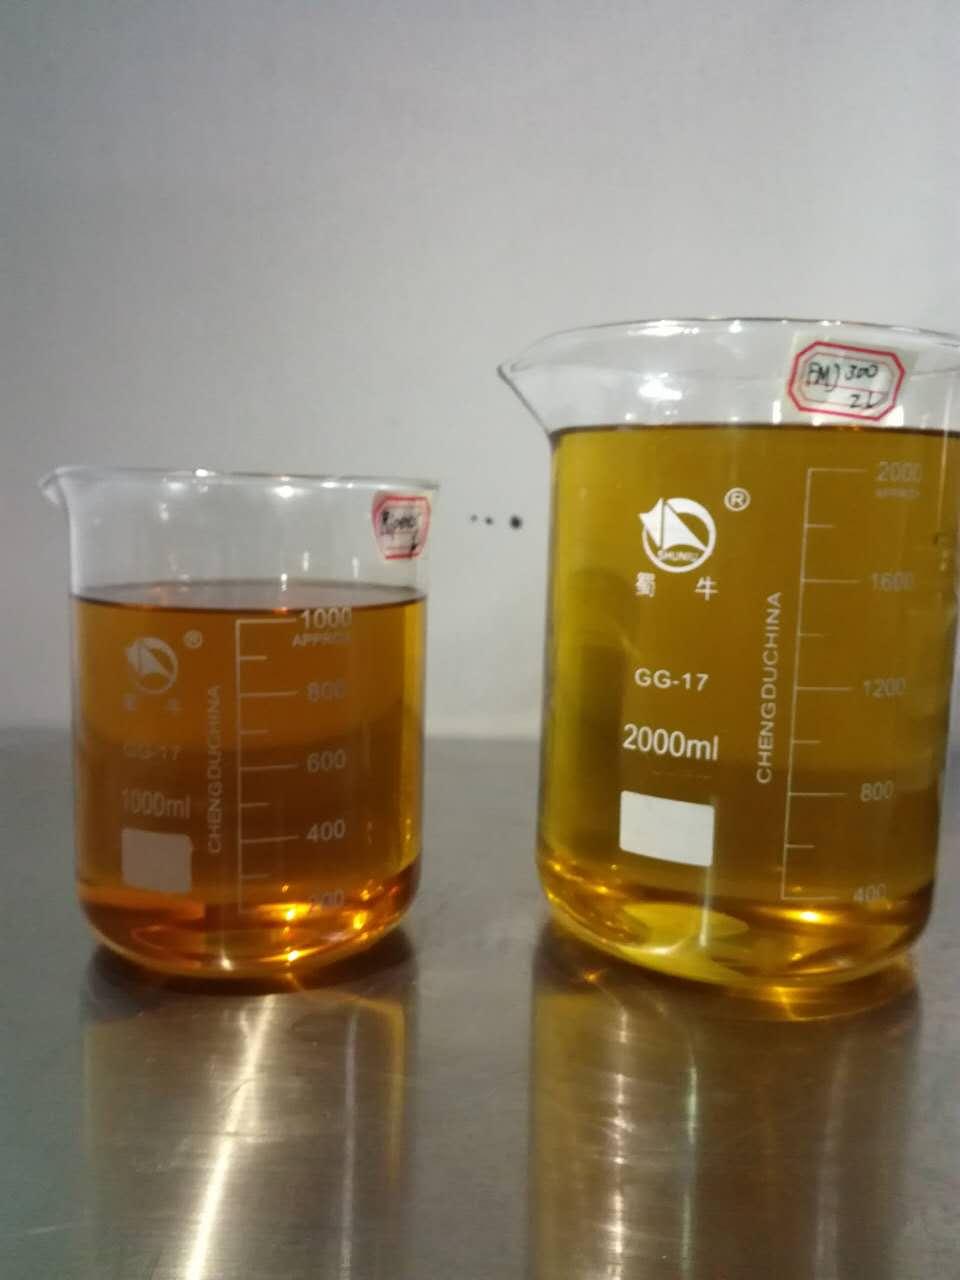 Boldenone Undecylenate Equipoise Liquid Steroid